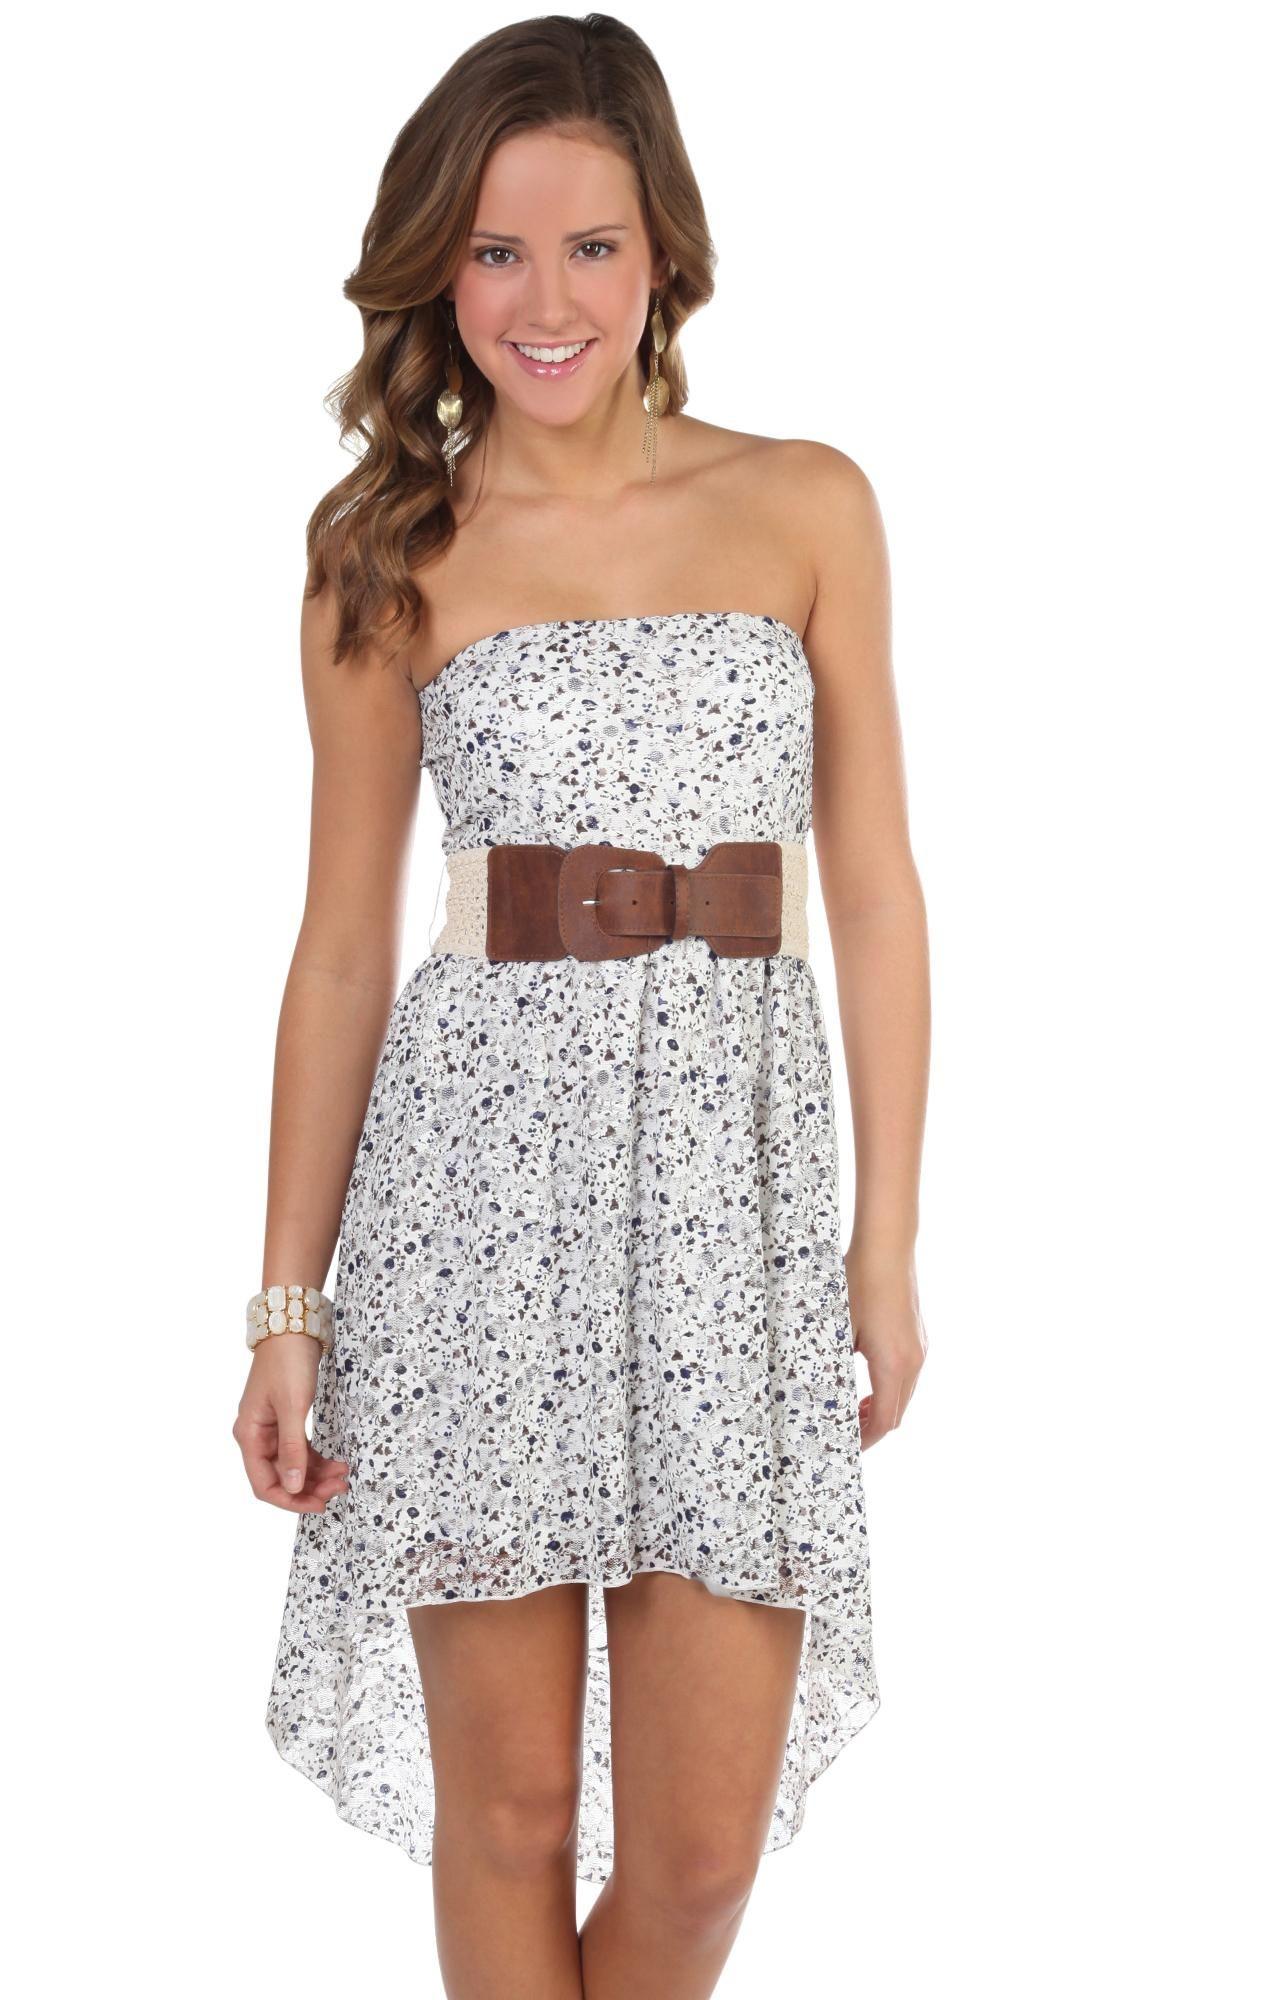 Debs Strapless Long Summer Dresses